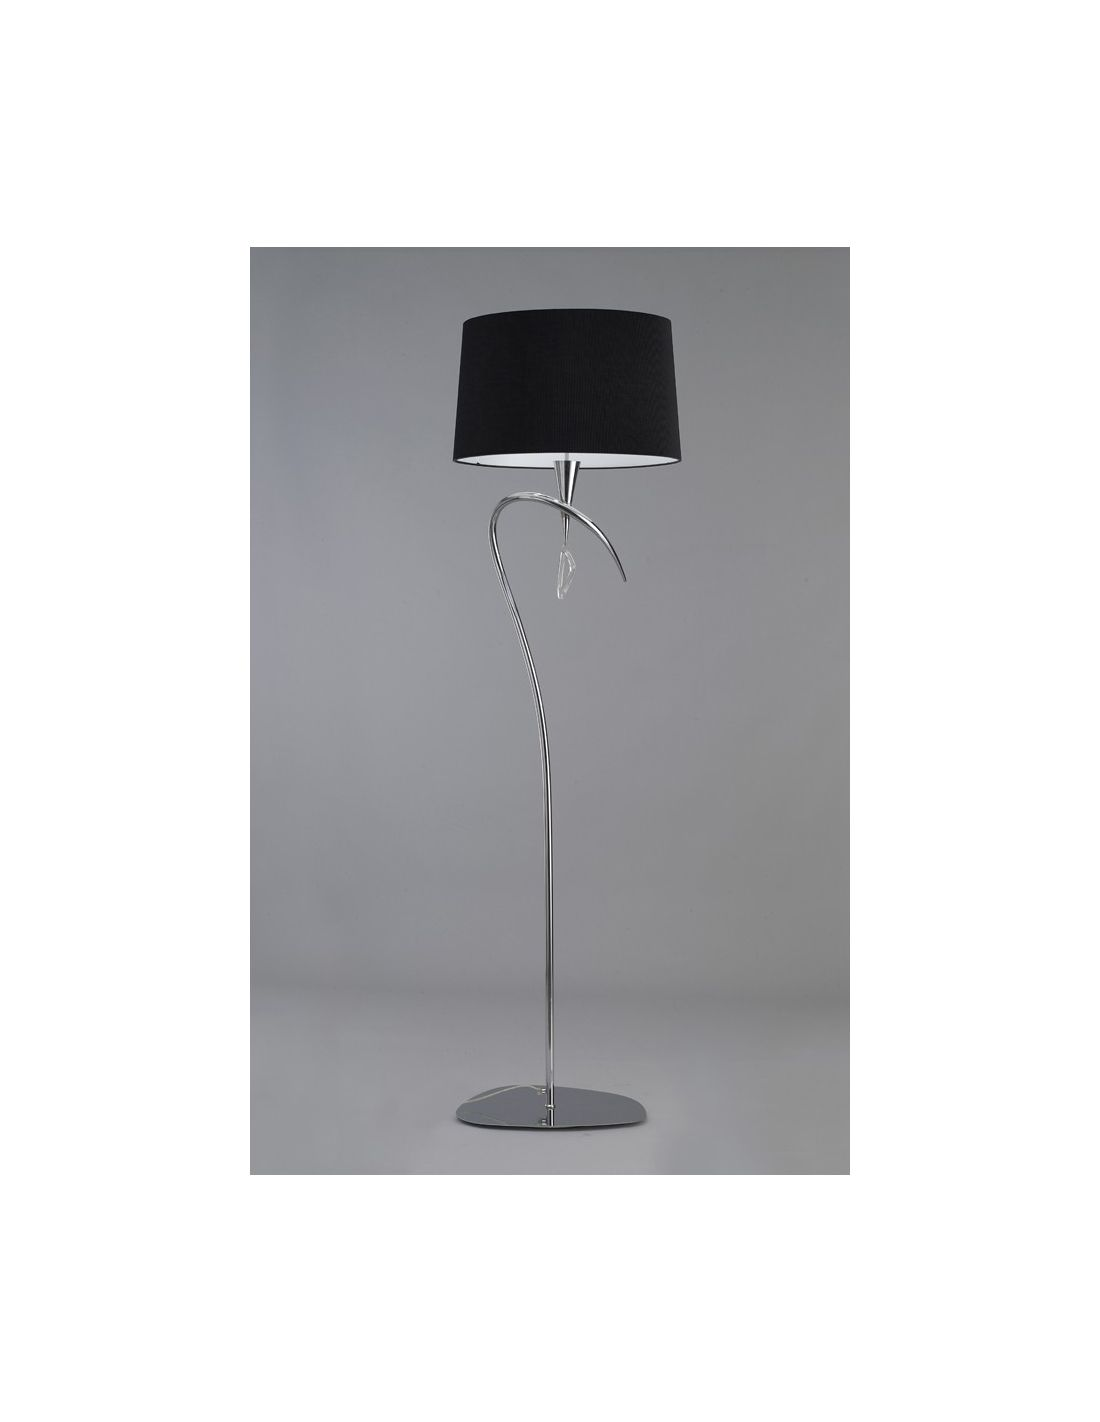 Iluminacion negra iluminacion color negro decoracion - Iluminacion lamparas de pie ...